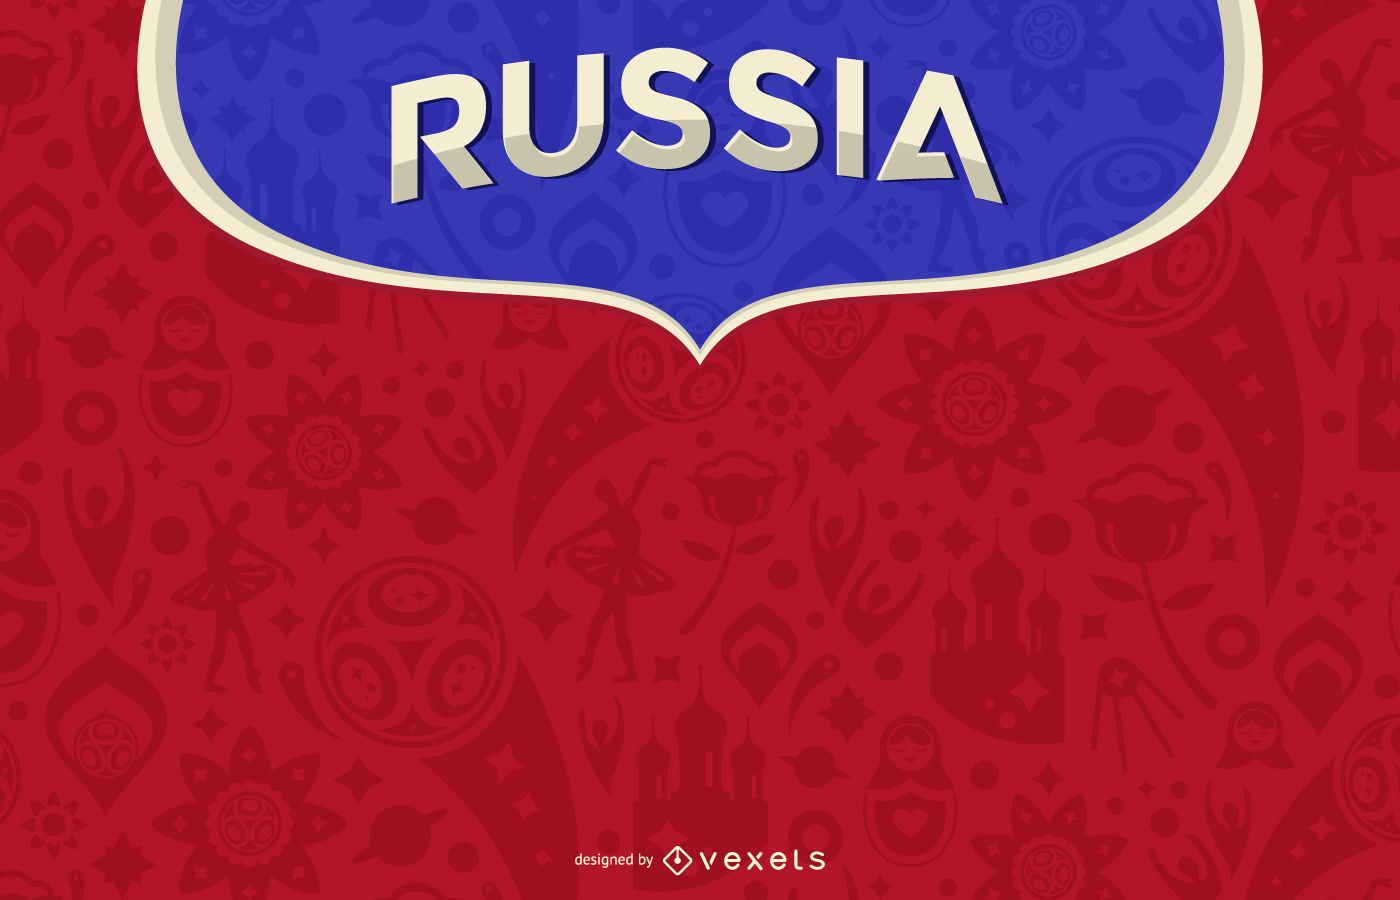 Russia 2018 background design